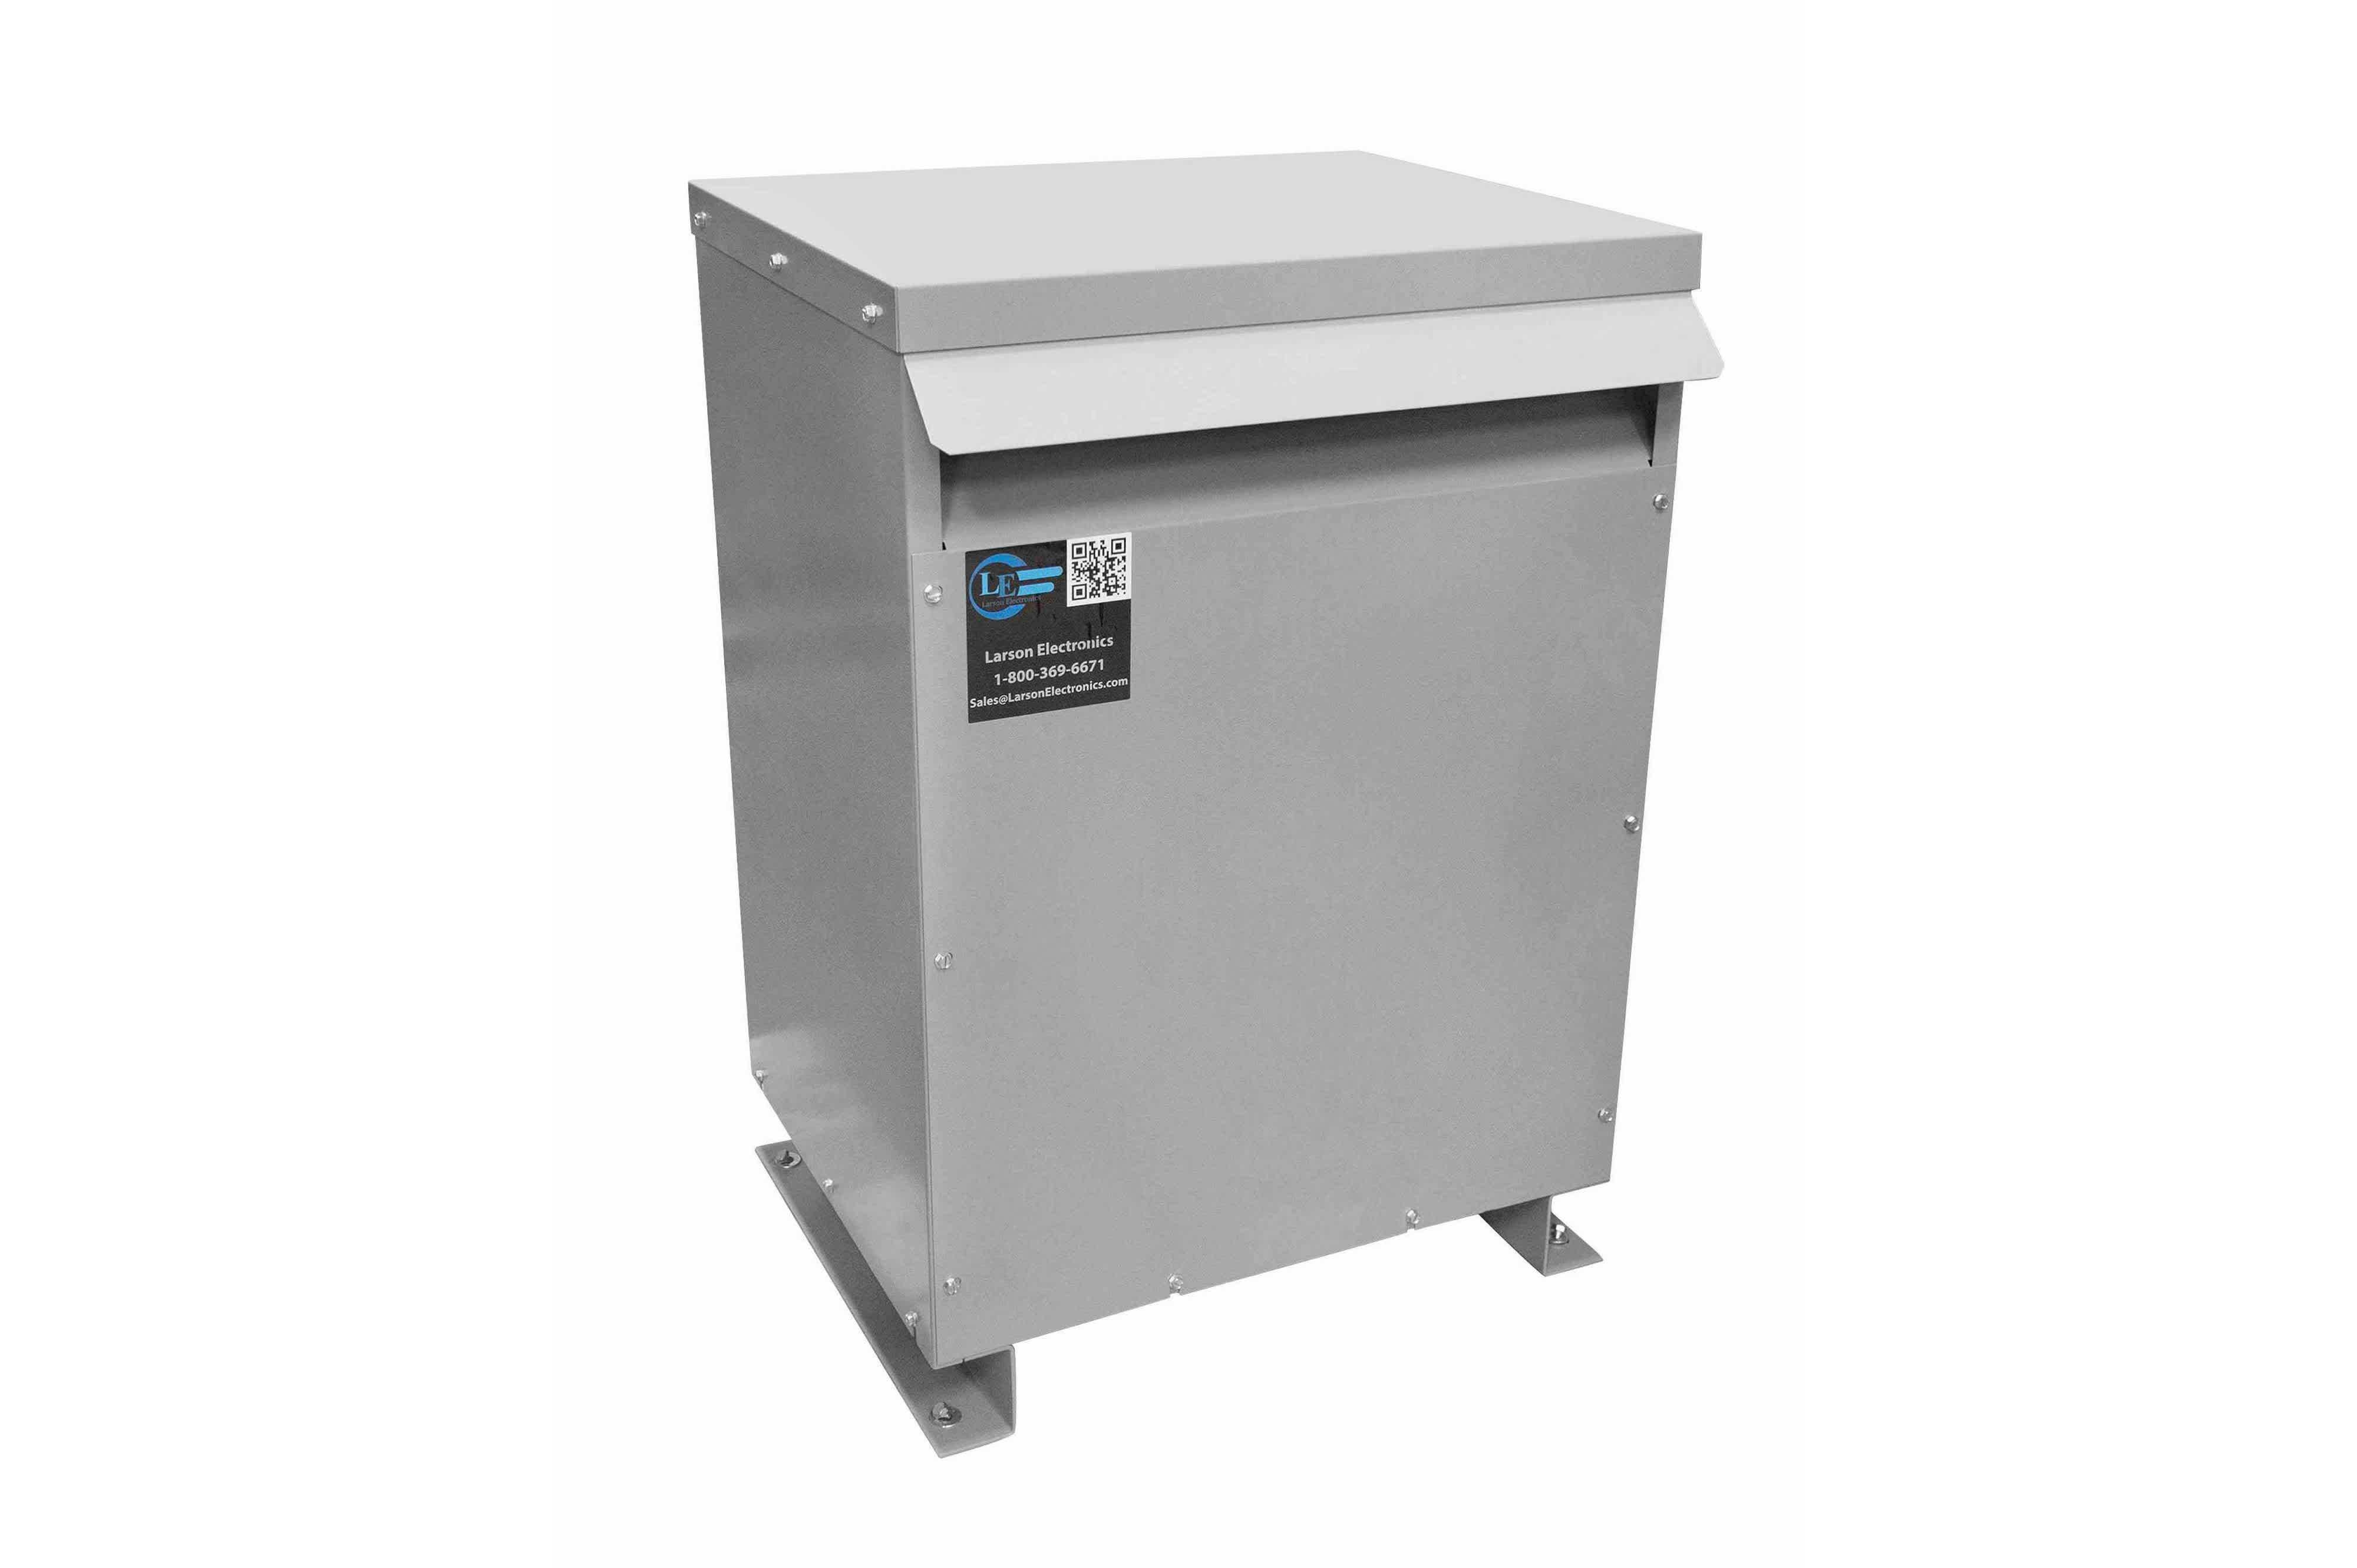 80 kVA 3PH Isolation Transformer, 240V Wye Primary, 480Y/277 Wye-N Secondary, N3R, Ventilated, 60 Hz